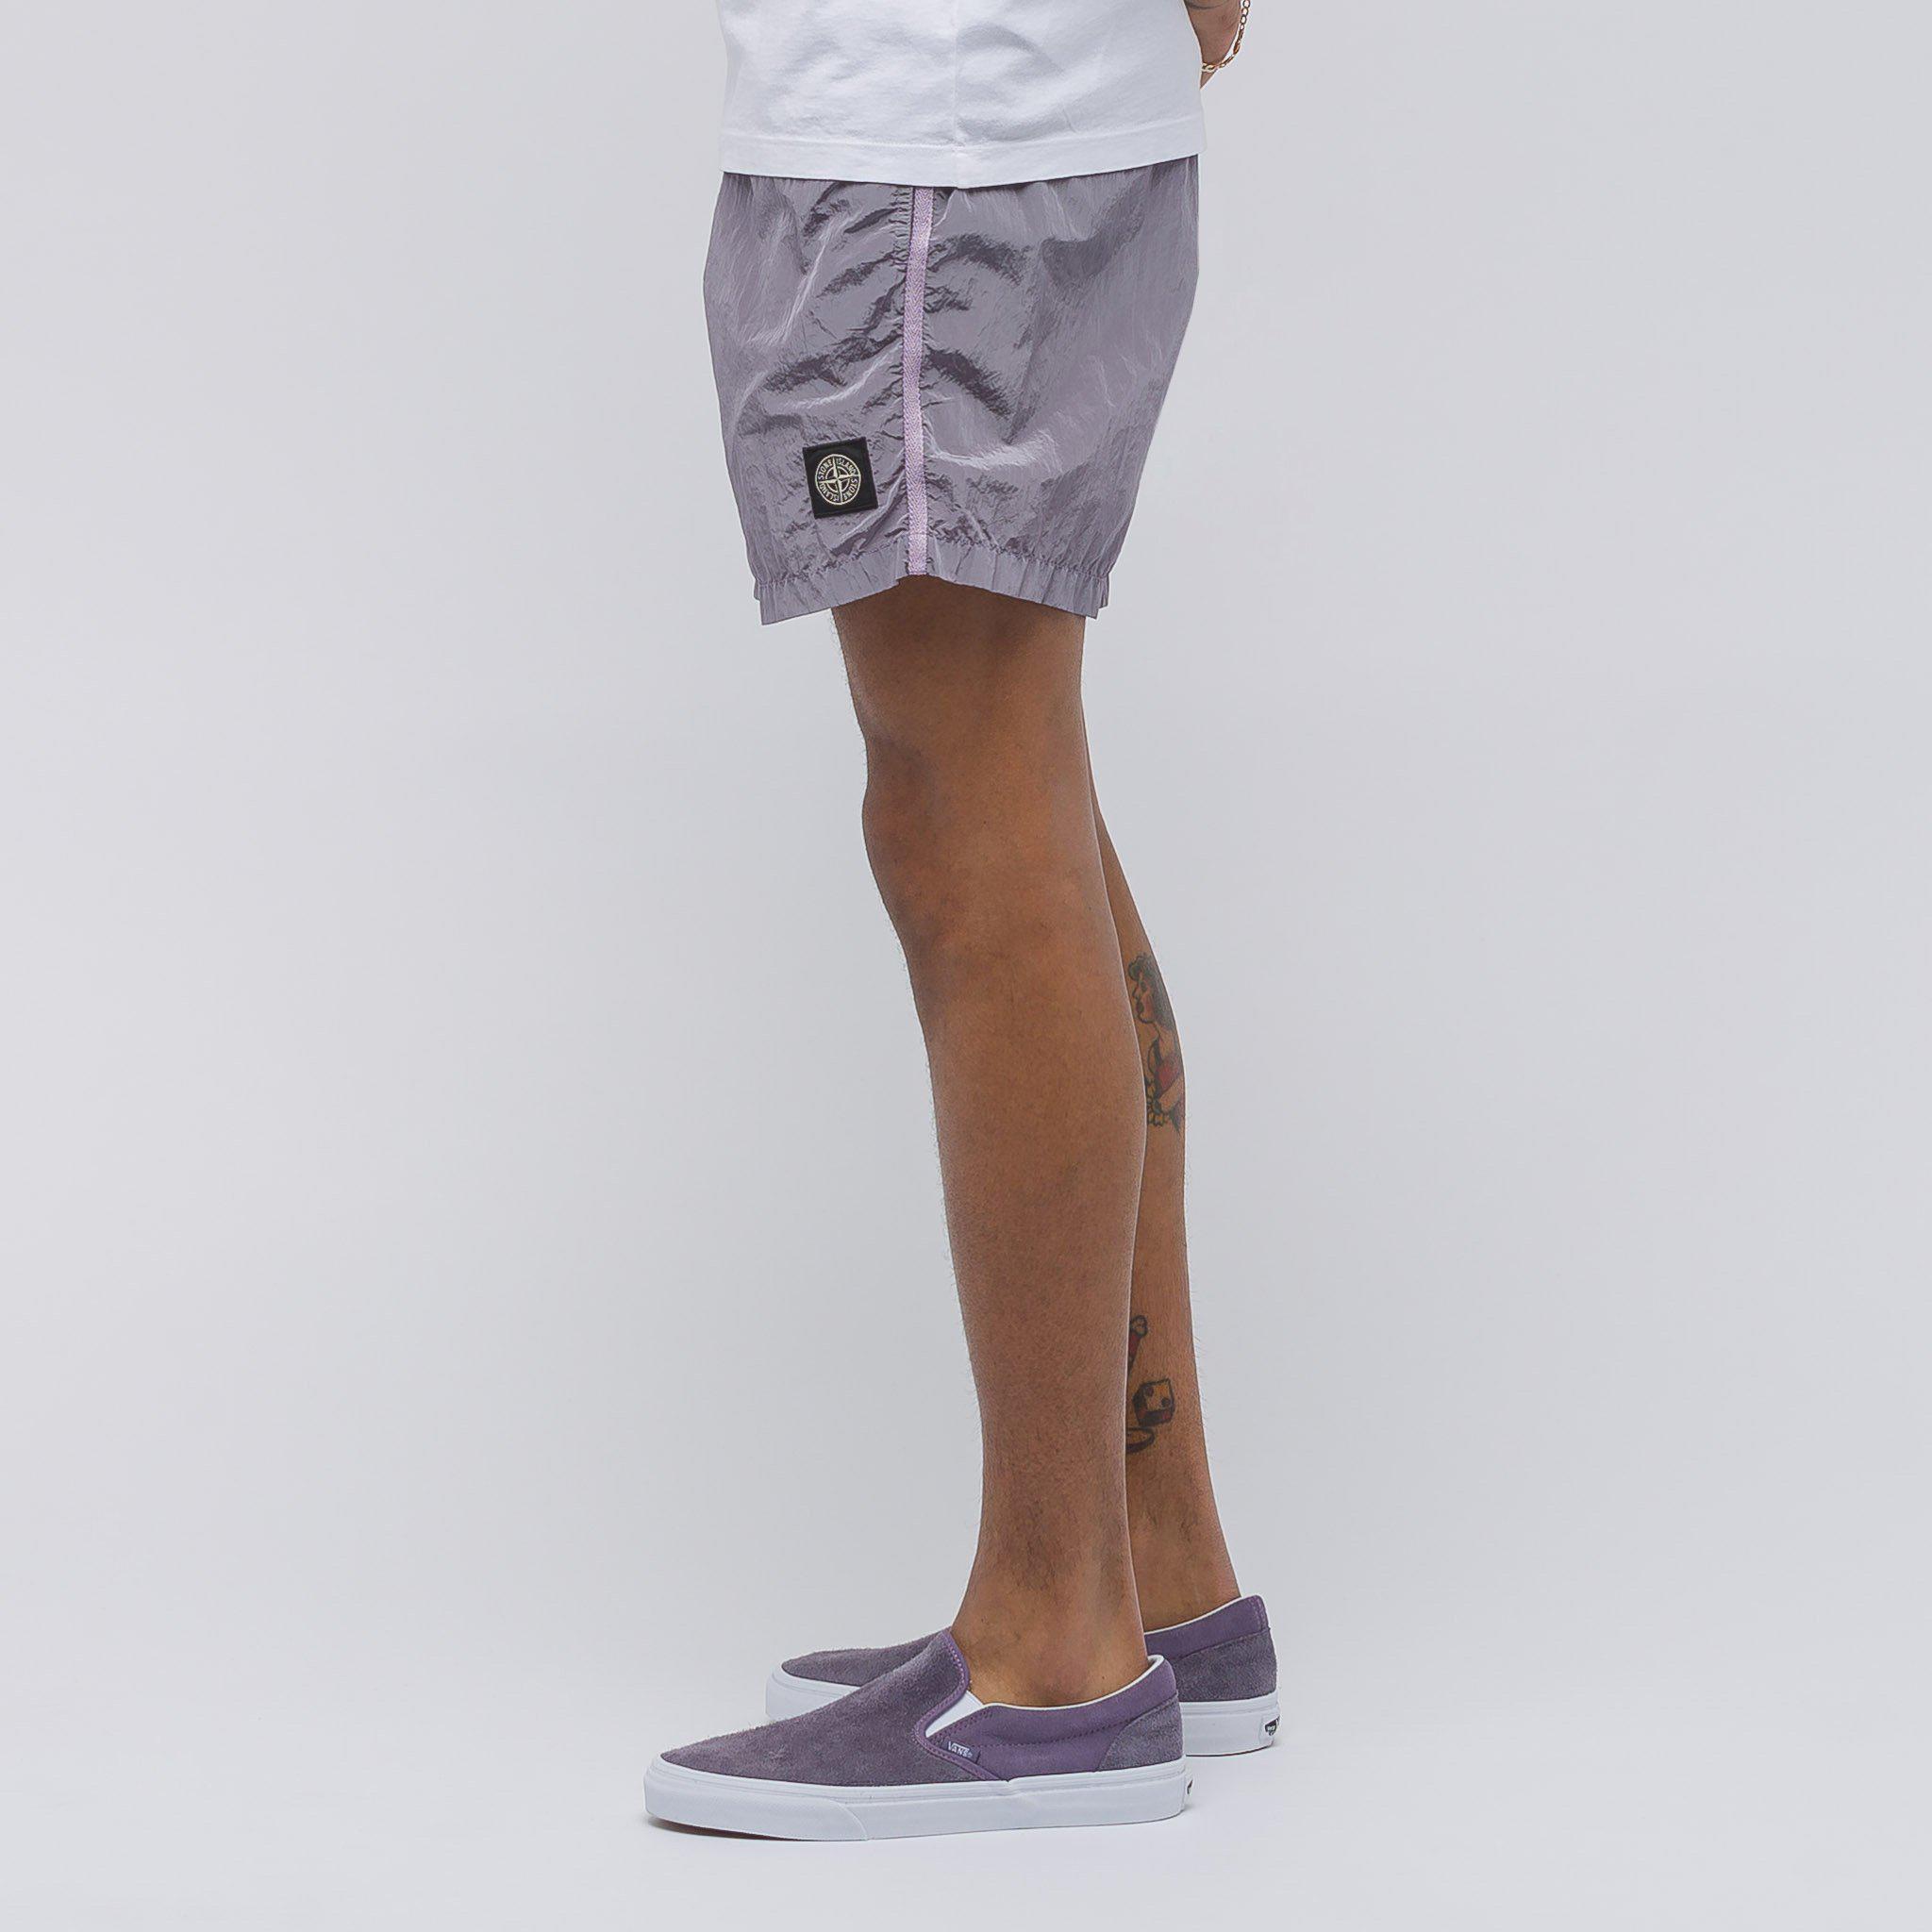 3be20da8ae Stone Island B0643 Swim Shorts In Lavender for Men - Lyst